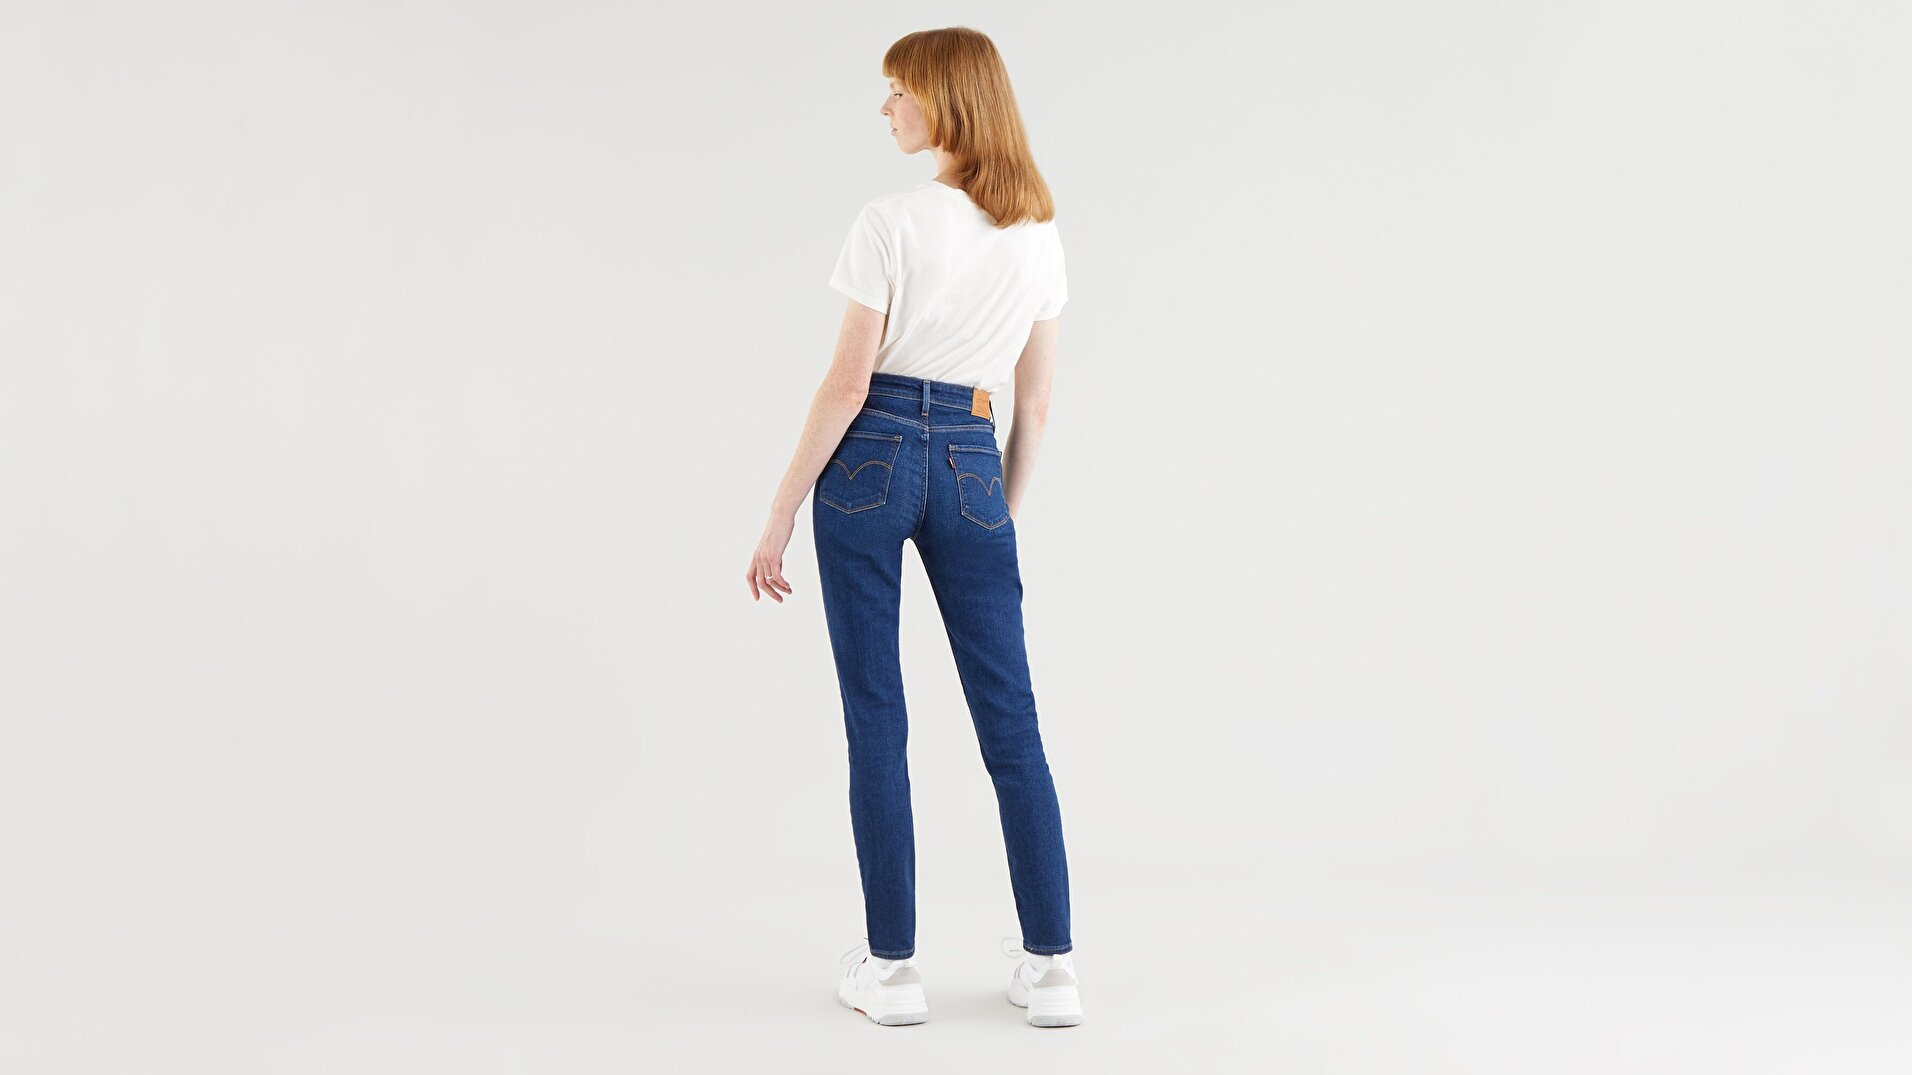 721 Yüksel Bel Skinny Fit Kadın Jean Pantolon-Good Evening